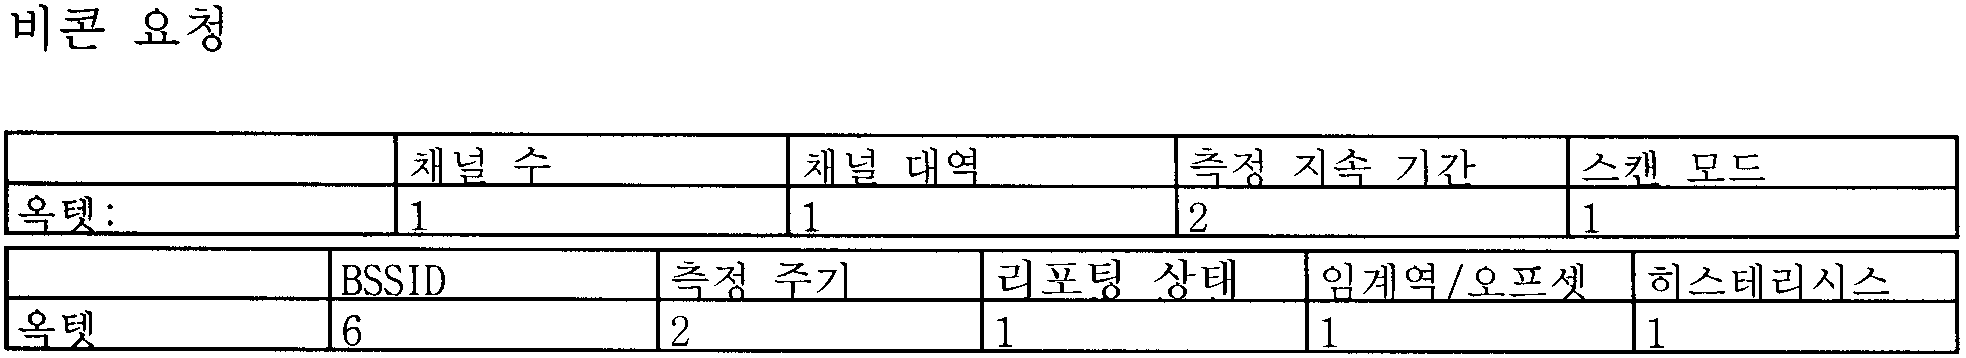 Figure 112015028699688-pat00001